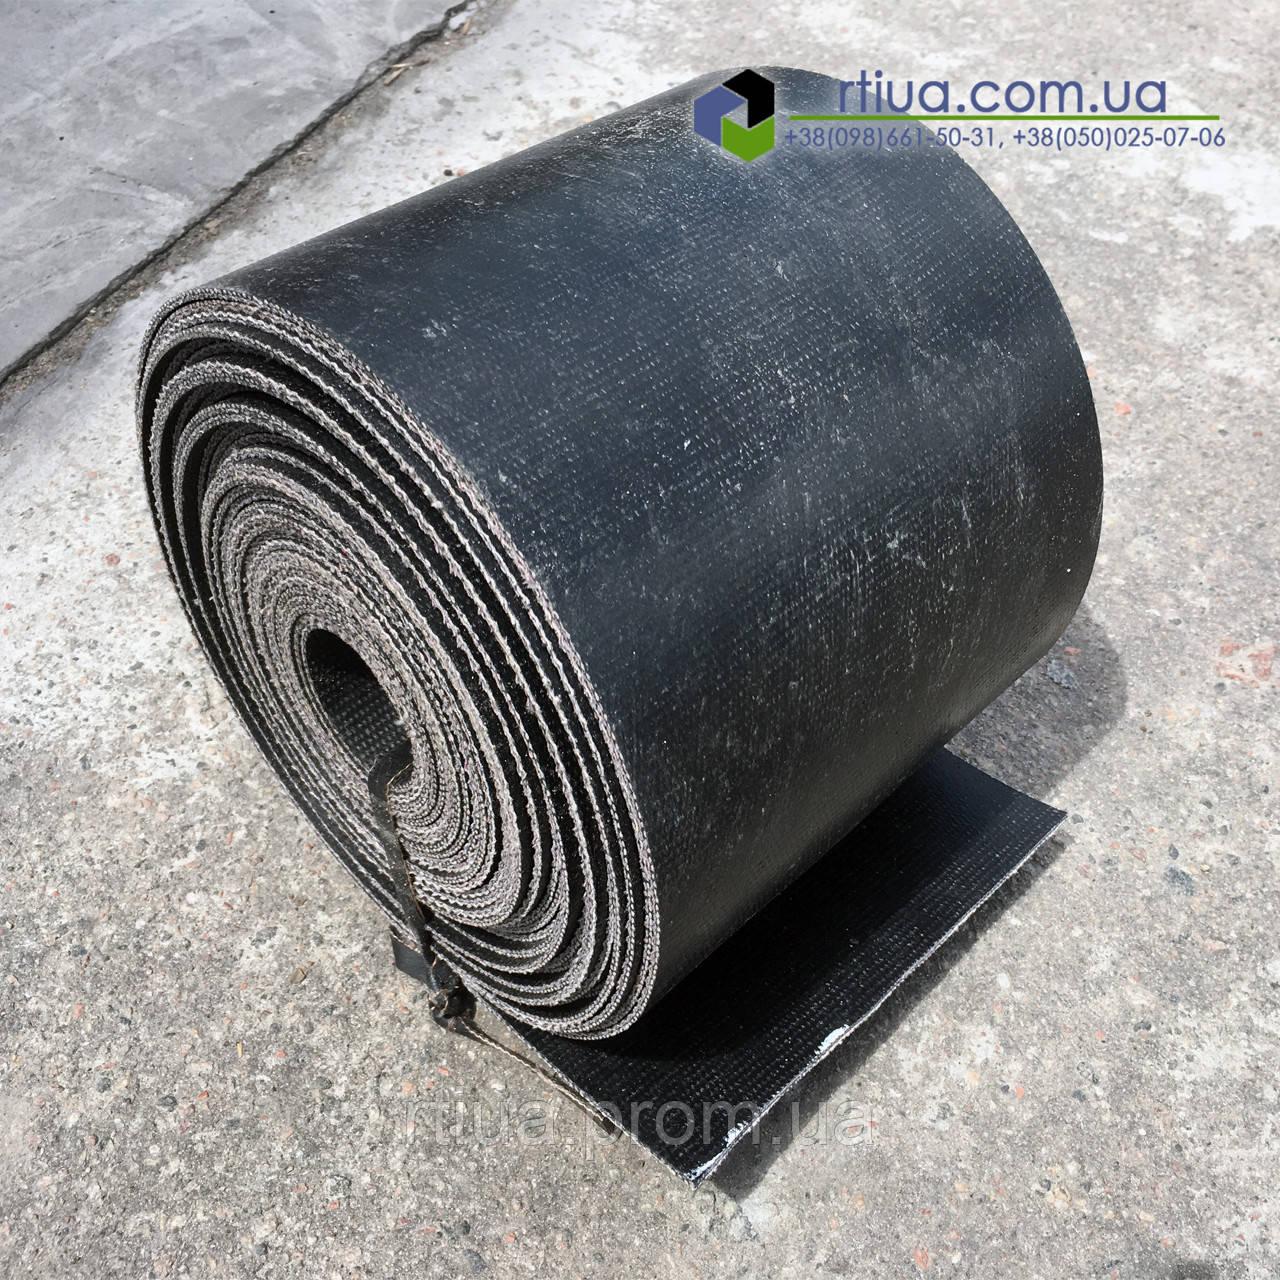 Транспортерная лента ТК-200, 1000х4 - 4/2 (10 мм)